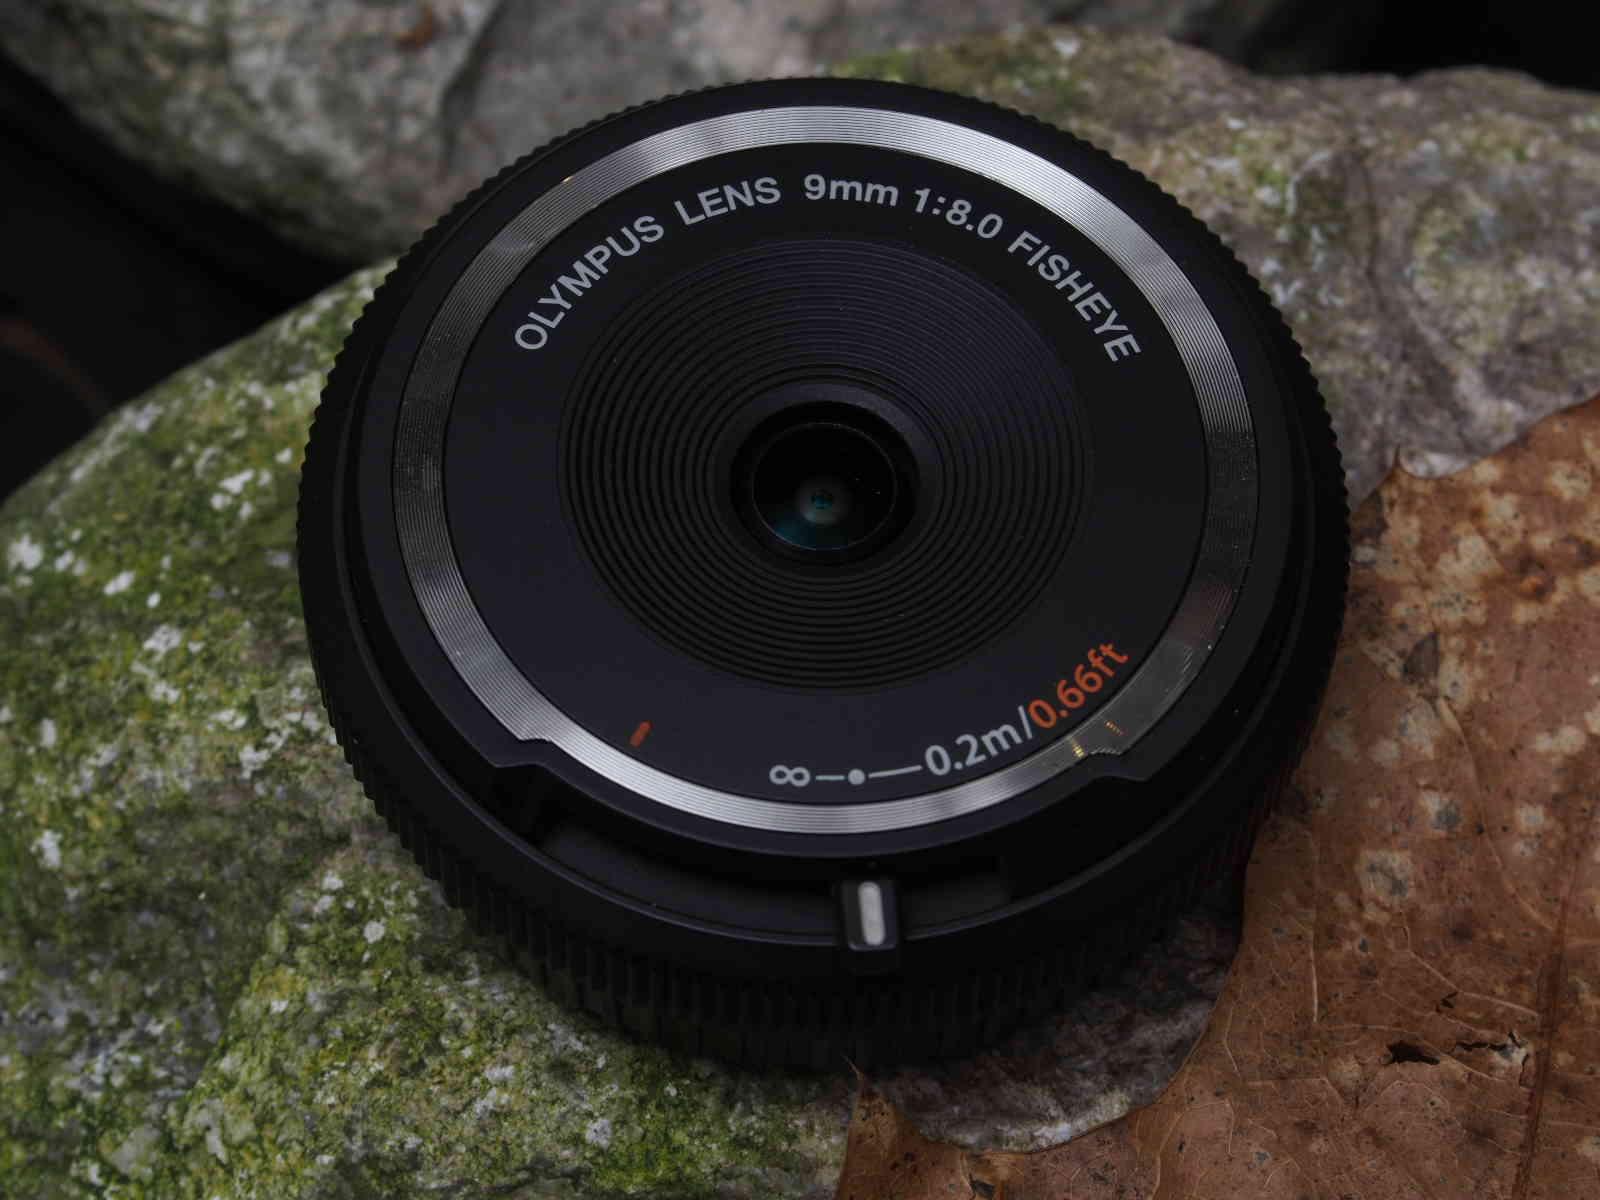 Olympus Body Lens Cap 9mm 1:8,0